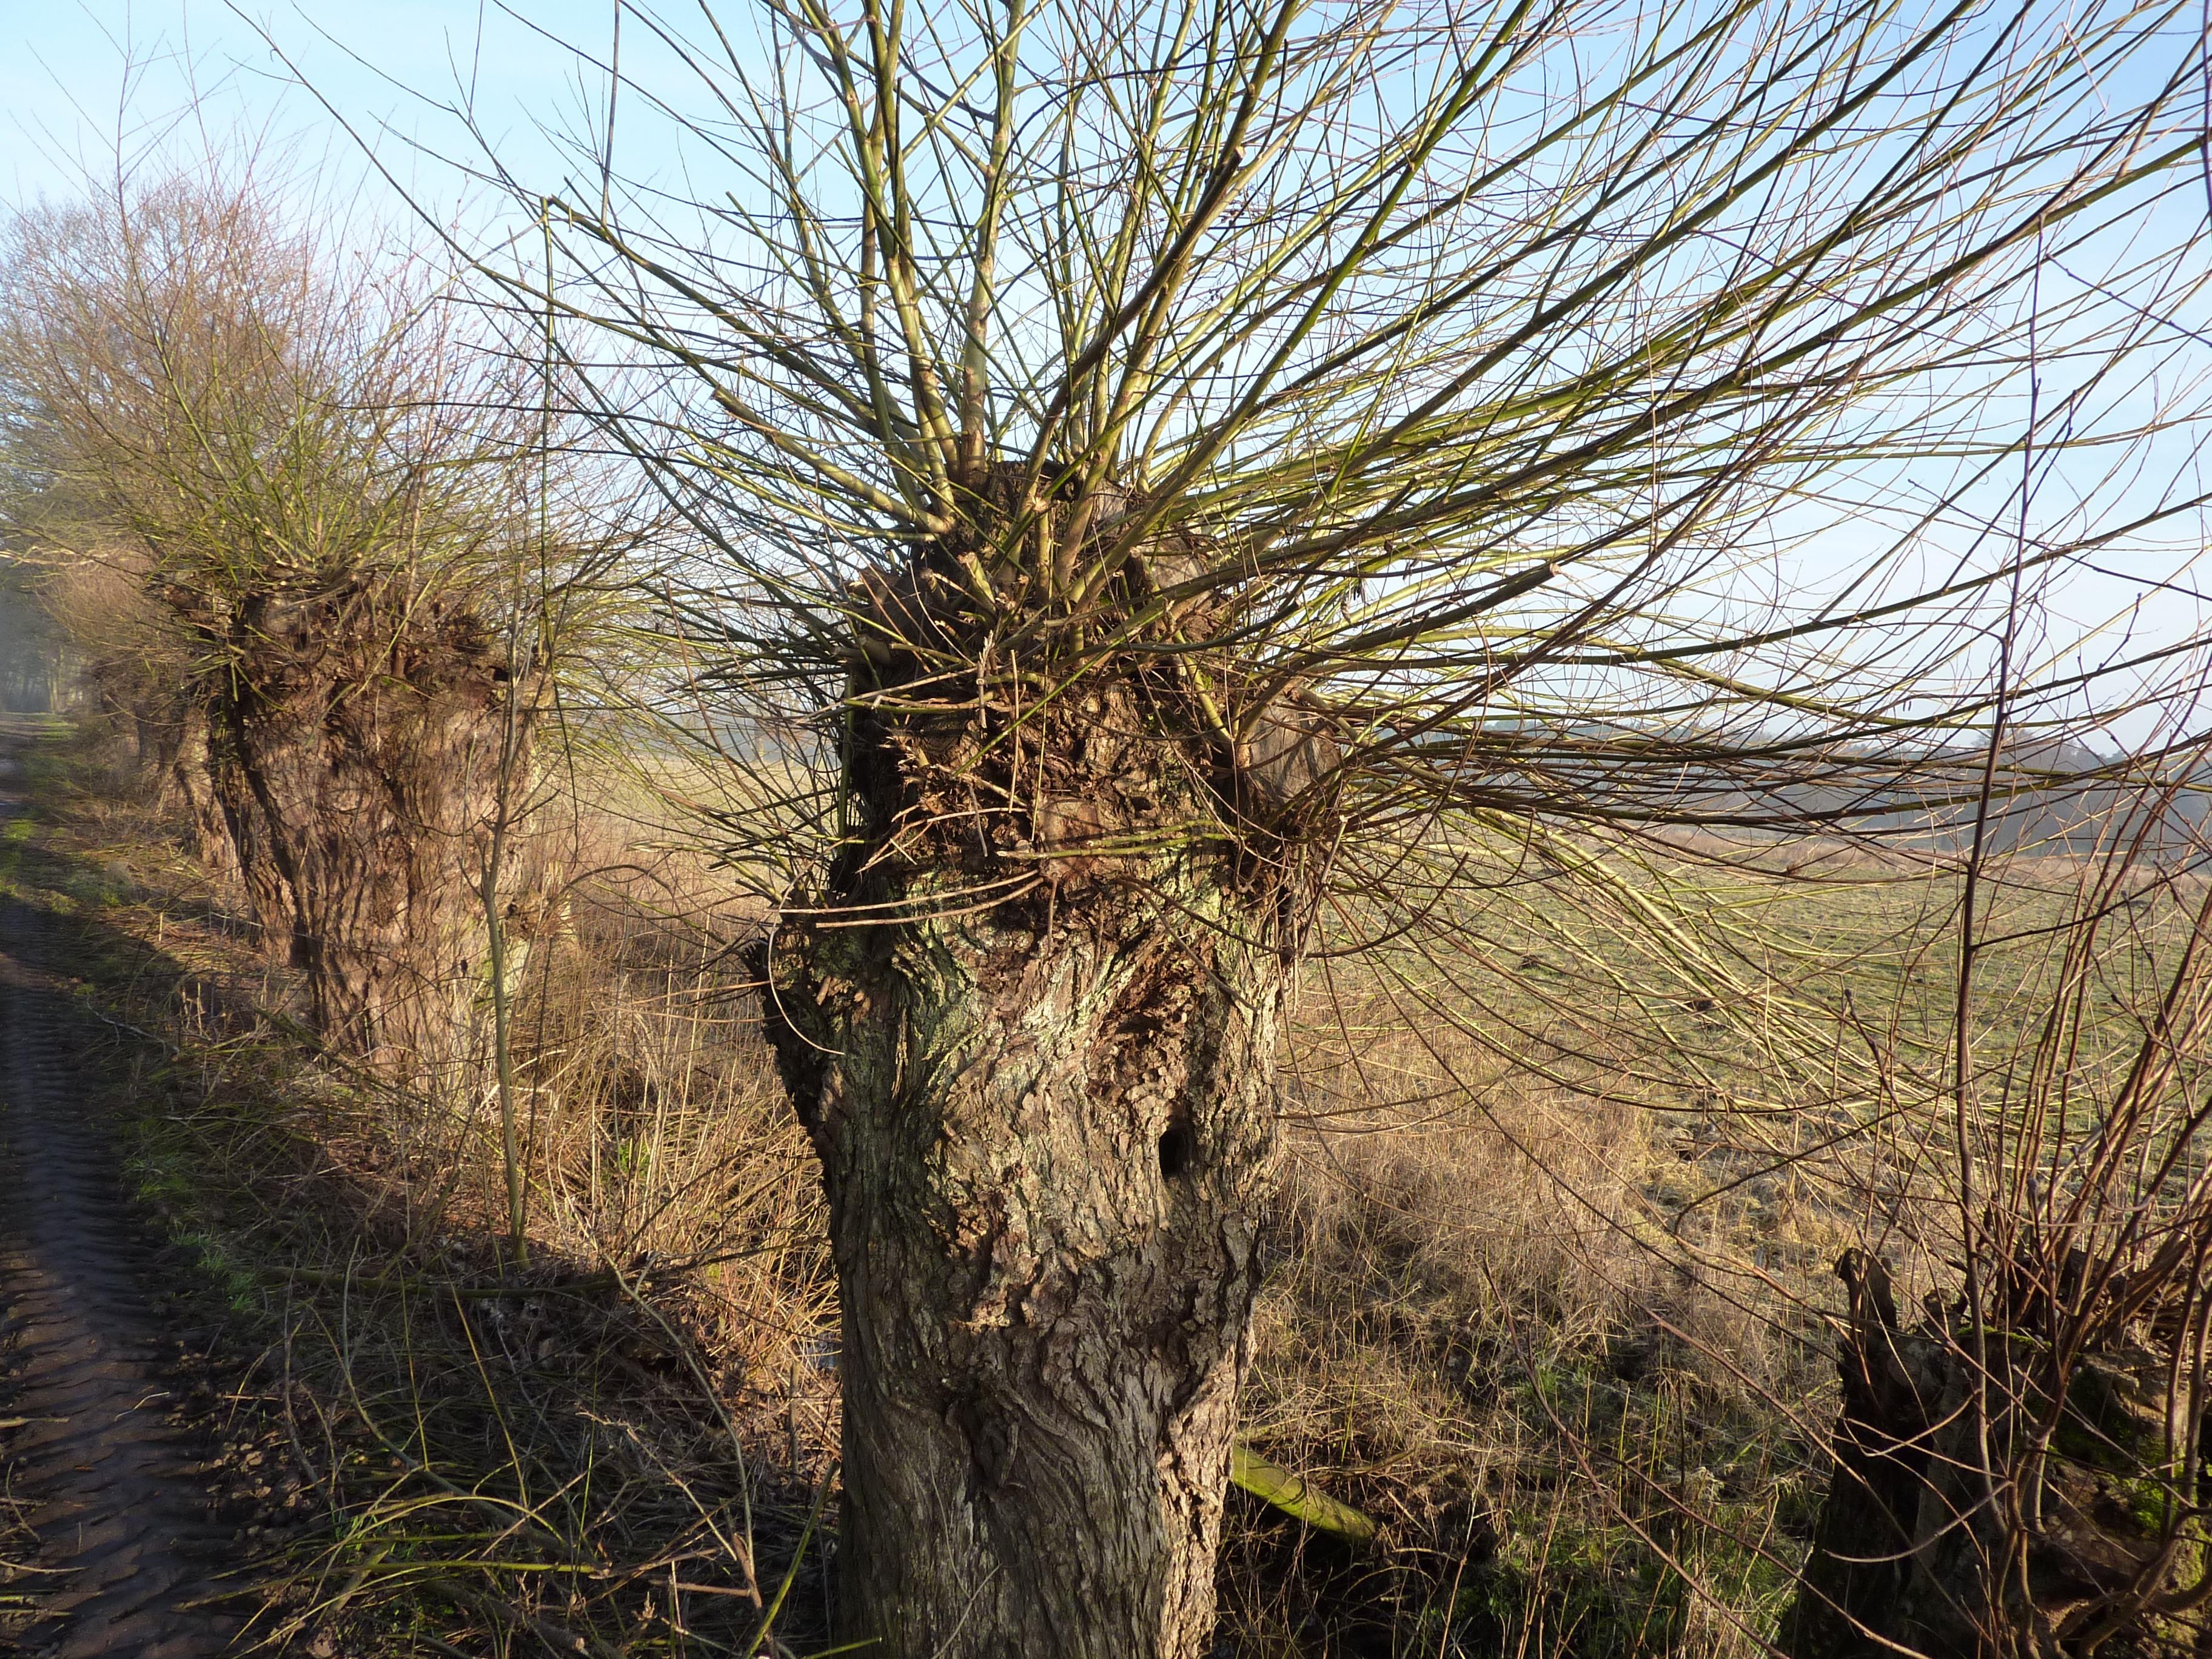 Kostenlose Foto Baum Kofferraum Weide Botanik Flora Flechten